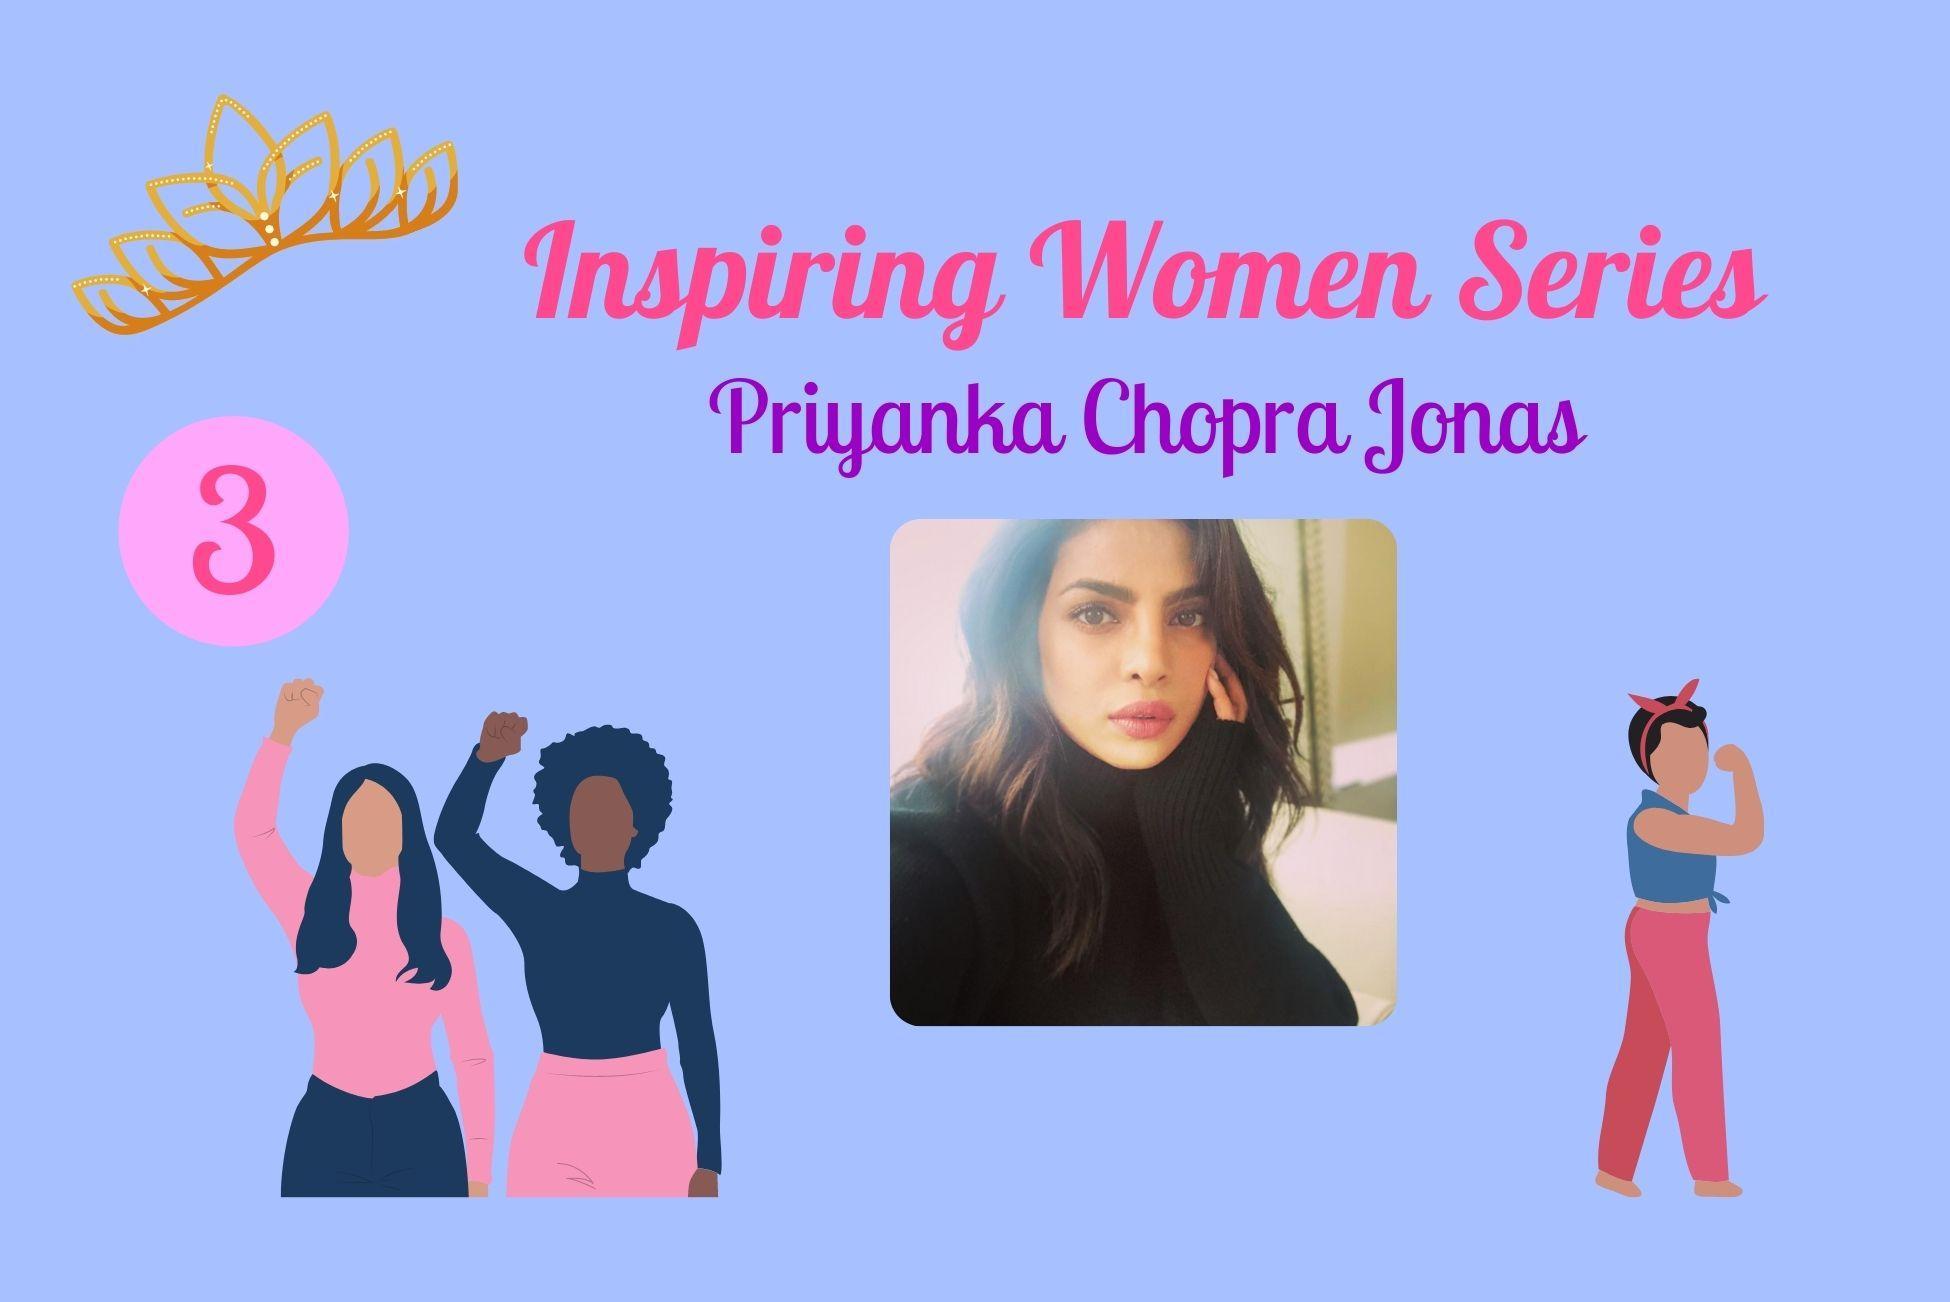 Inspiring Women Series – part 3: Priyanka Chopra Jonas